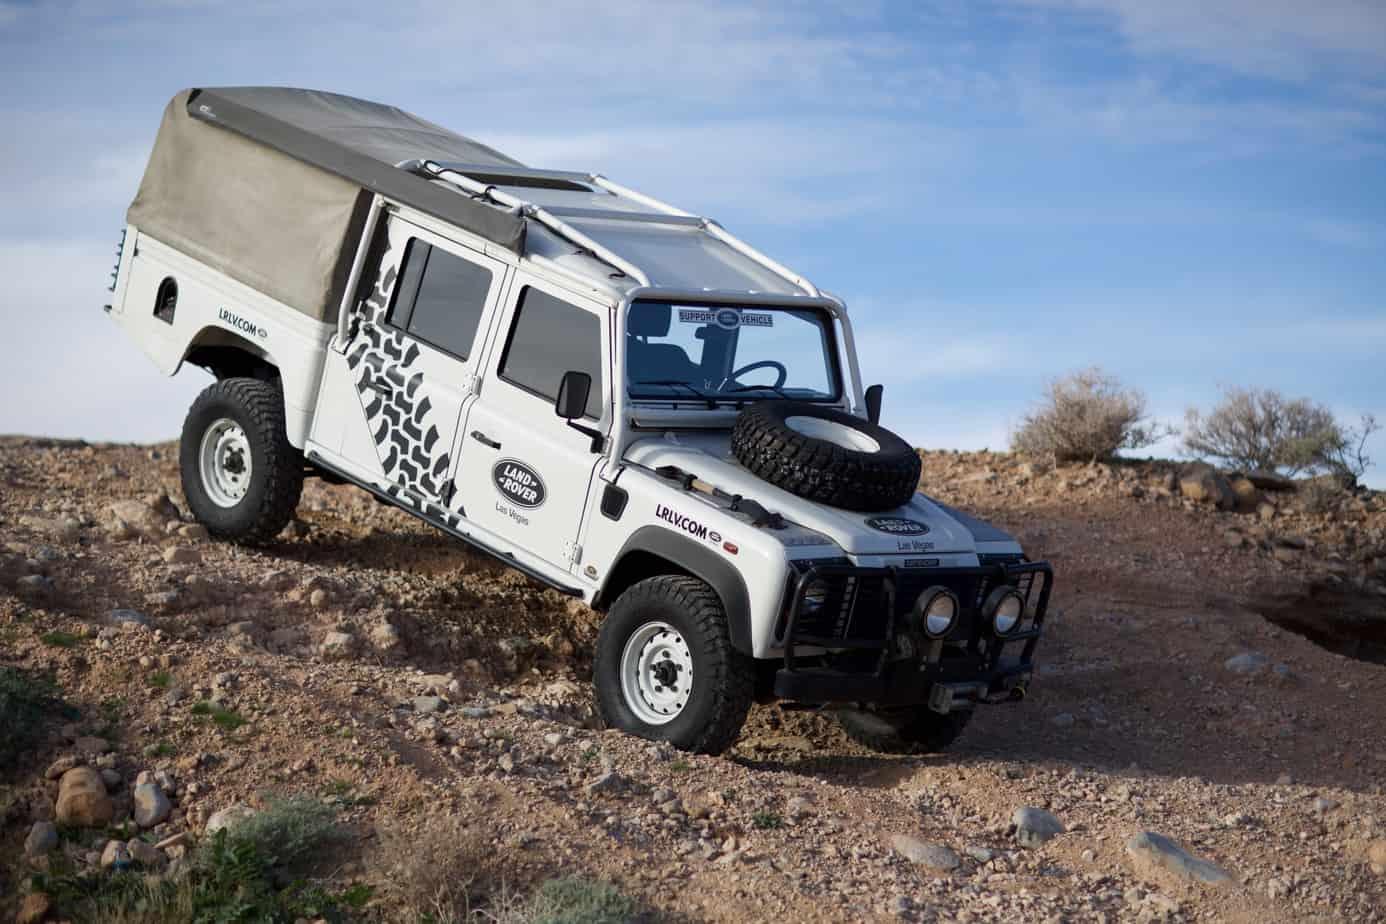 Land Rover Ambulance 130